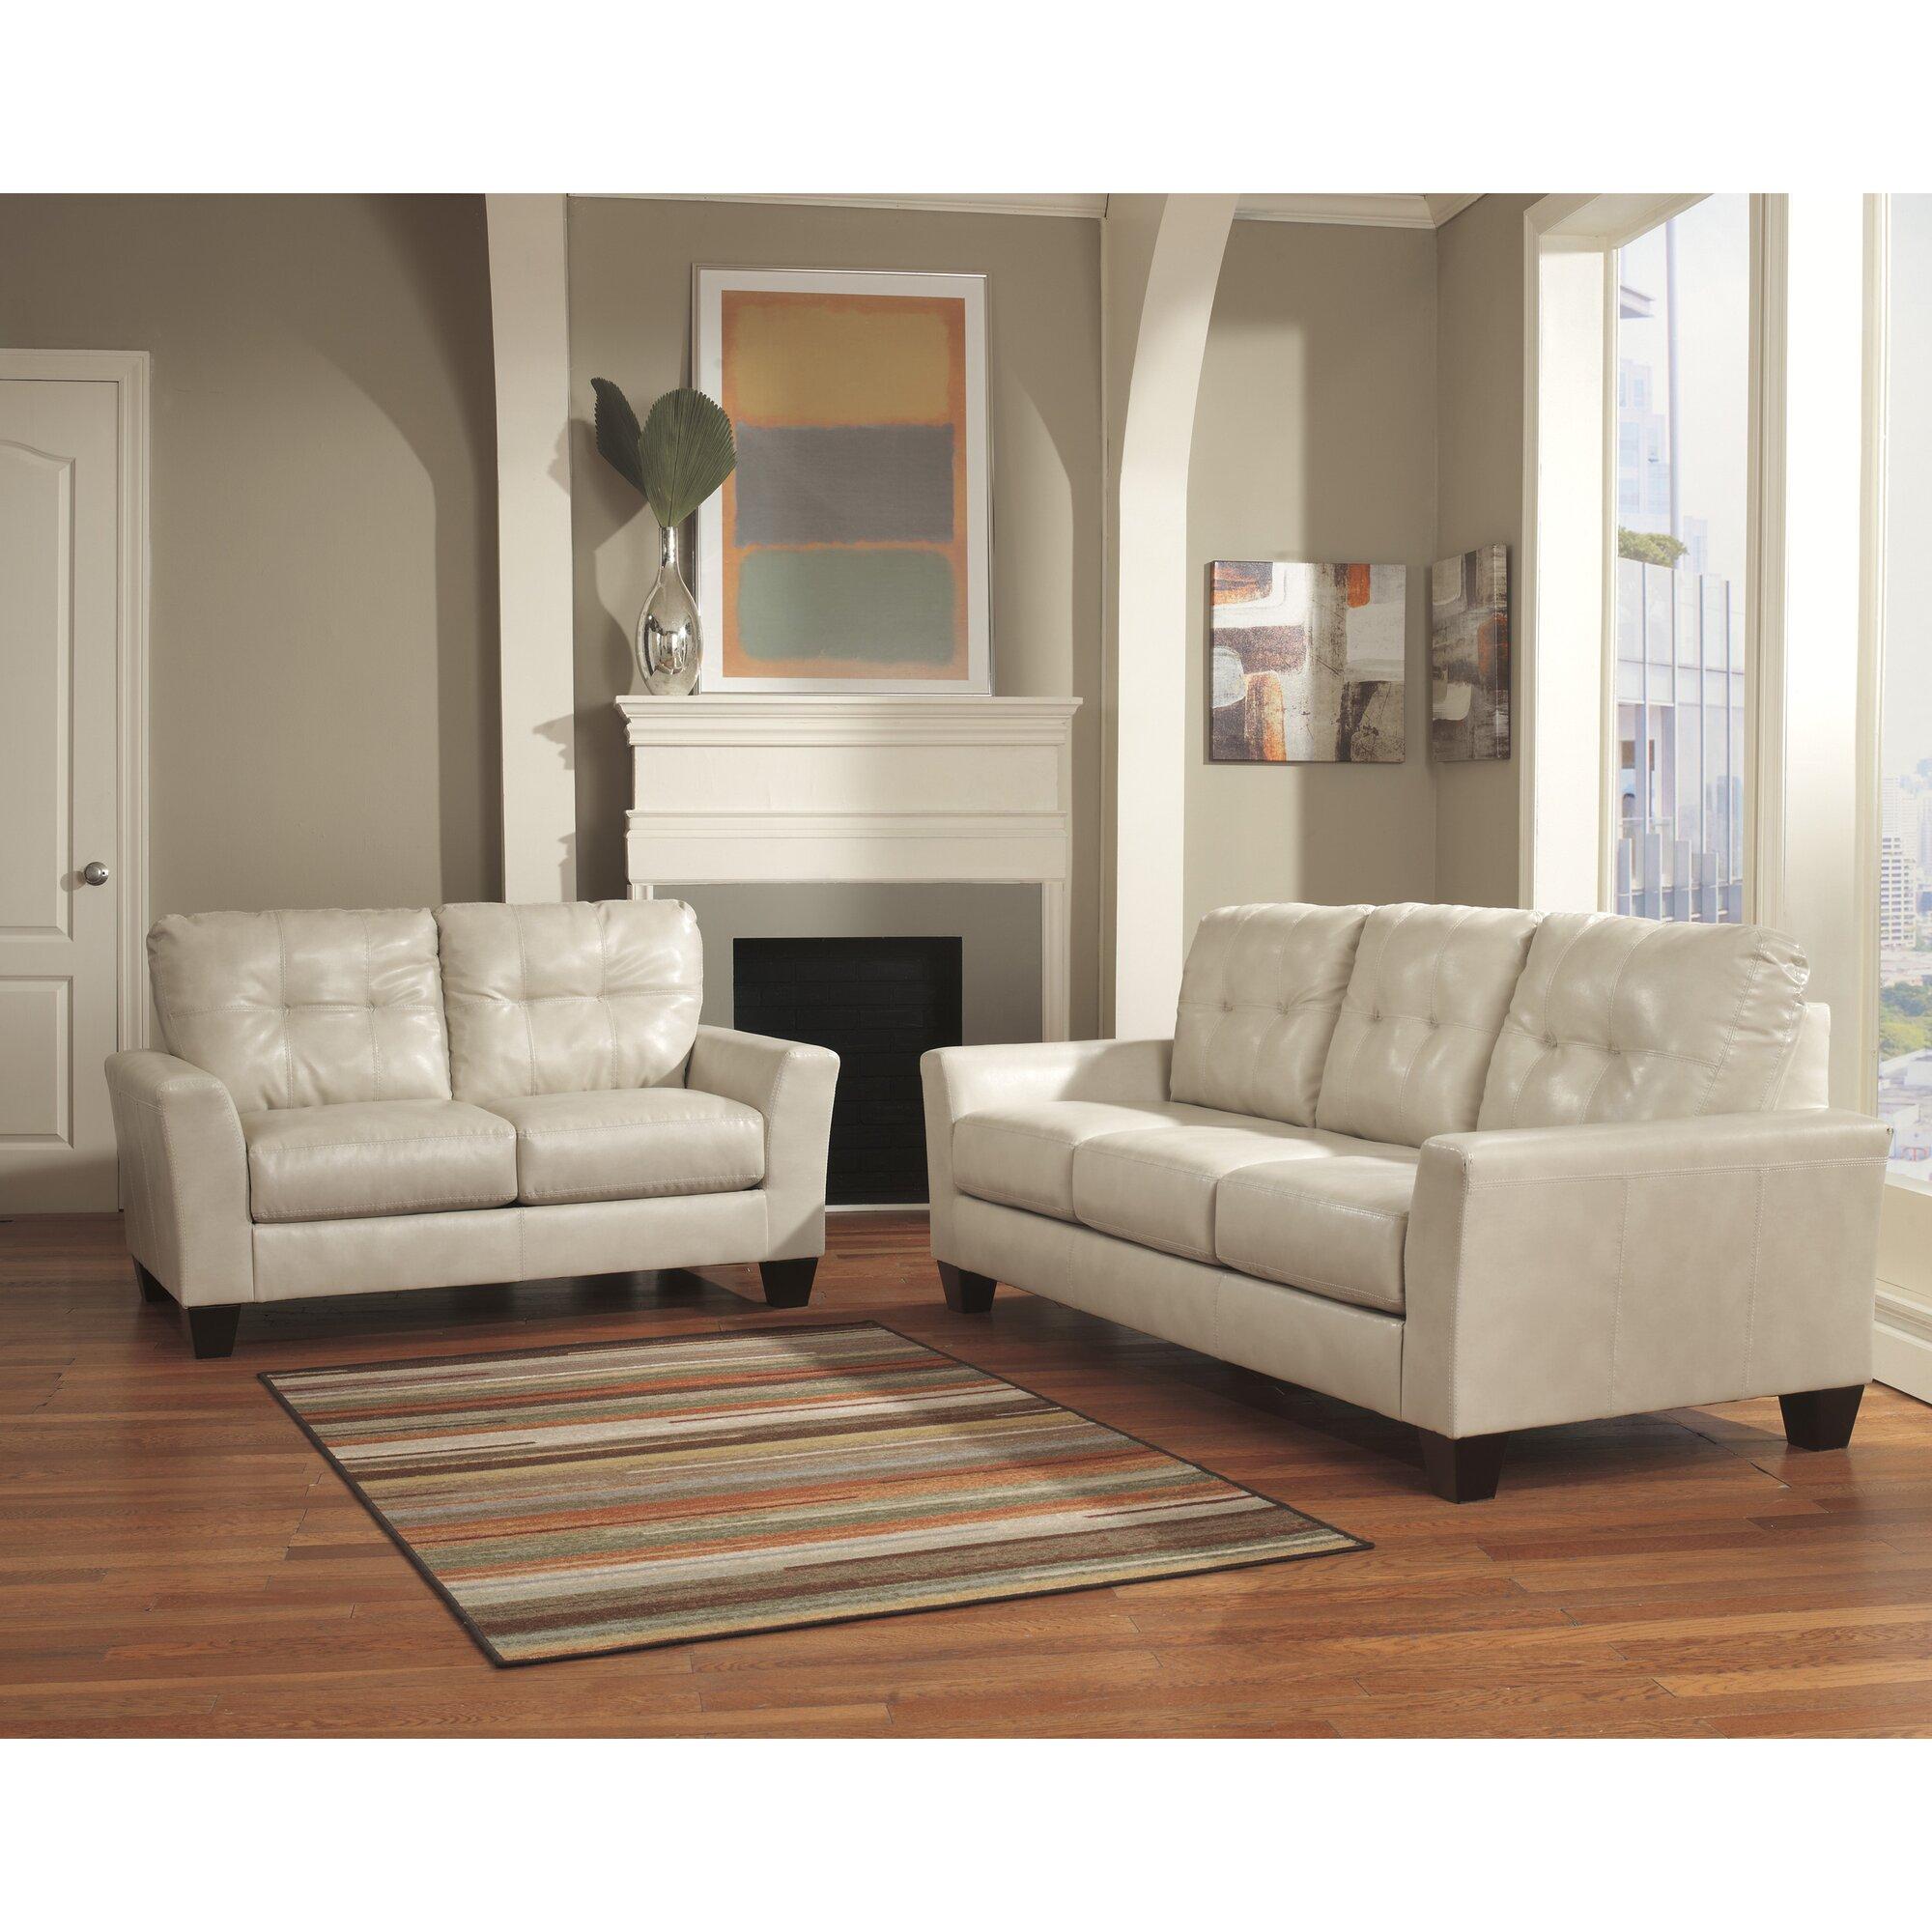 Flash furniture paulie living room set reviews wayfair for Wg r living room sets